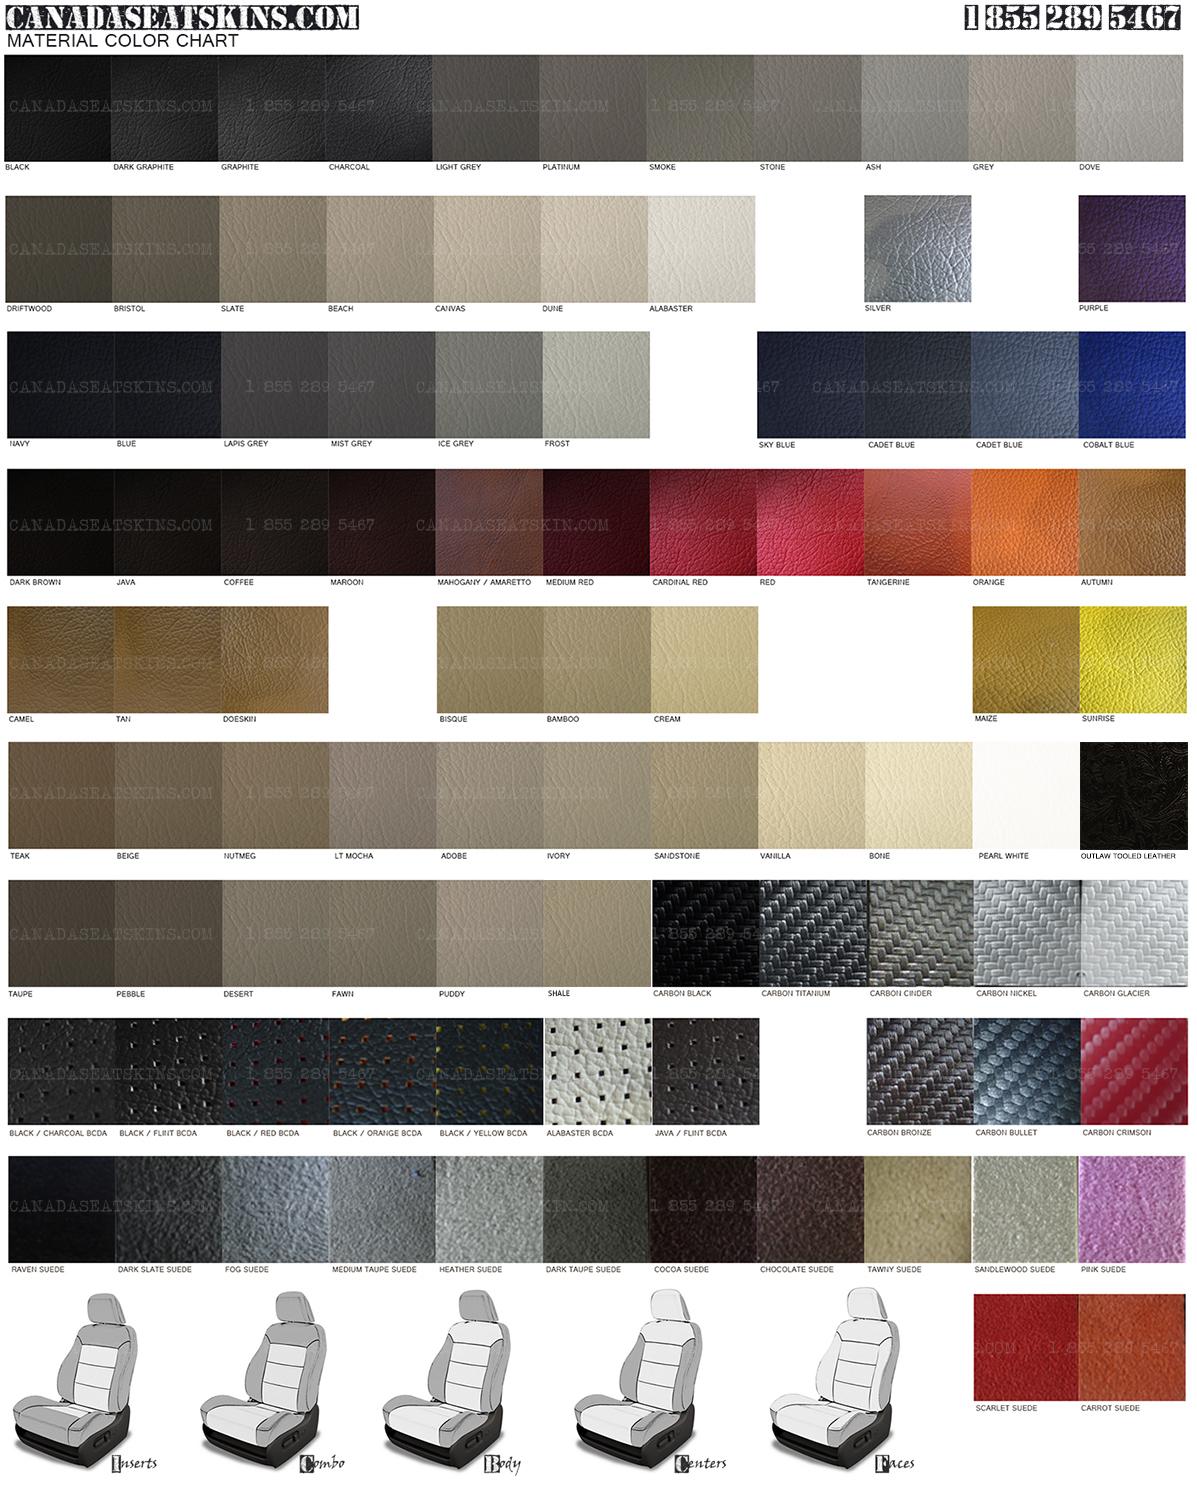 Exterior Colors For 2018 Equinox